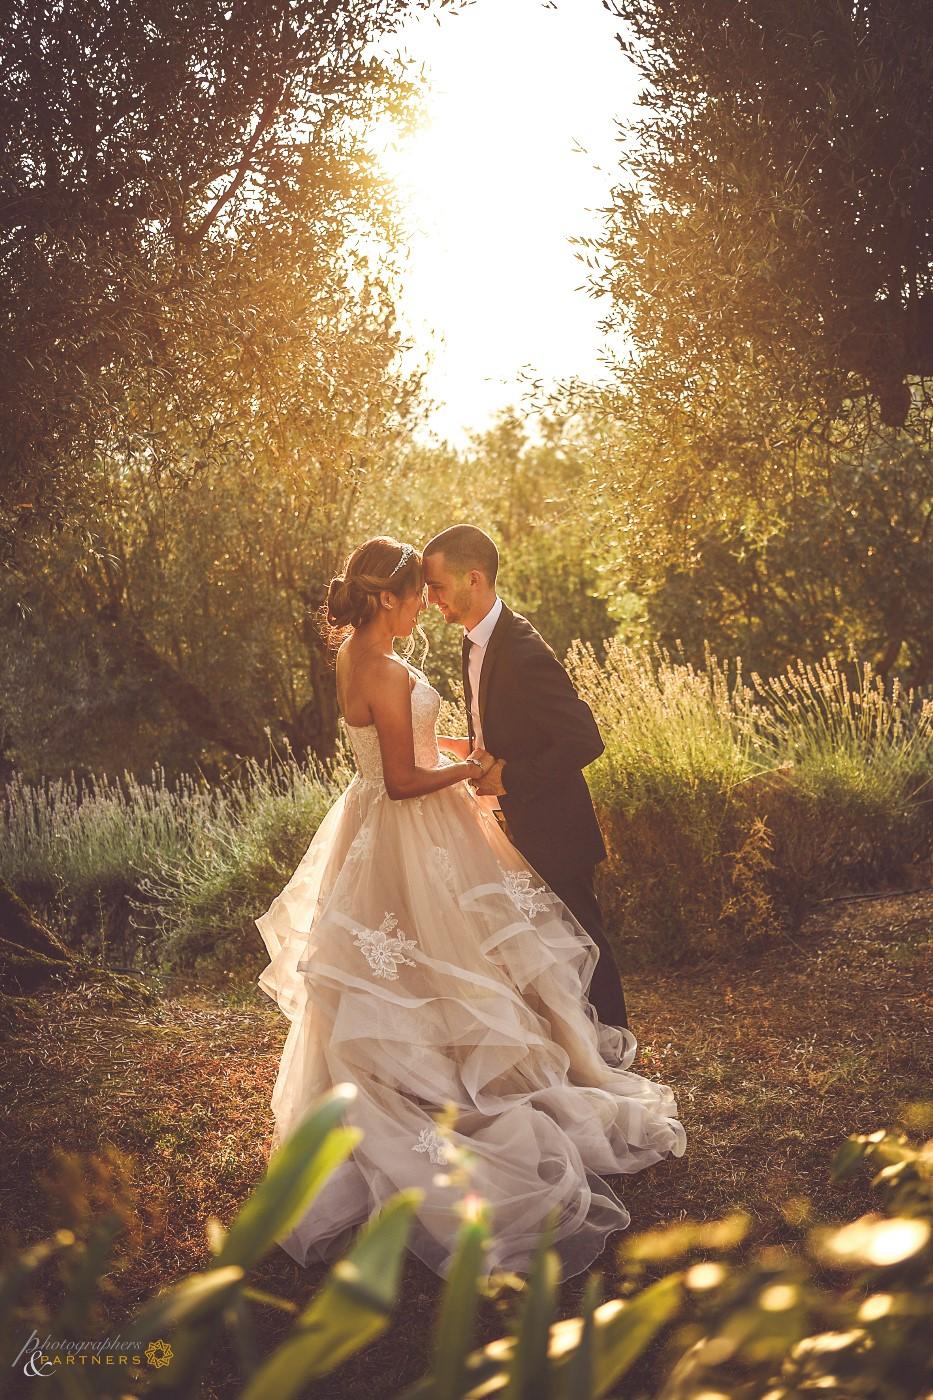 Romantic moment...